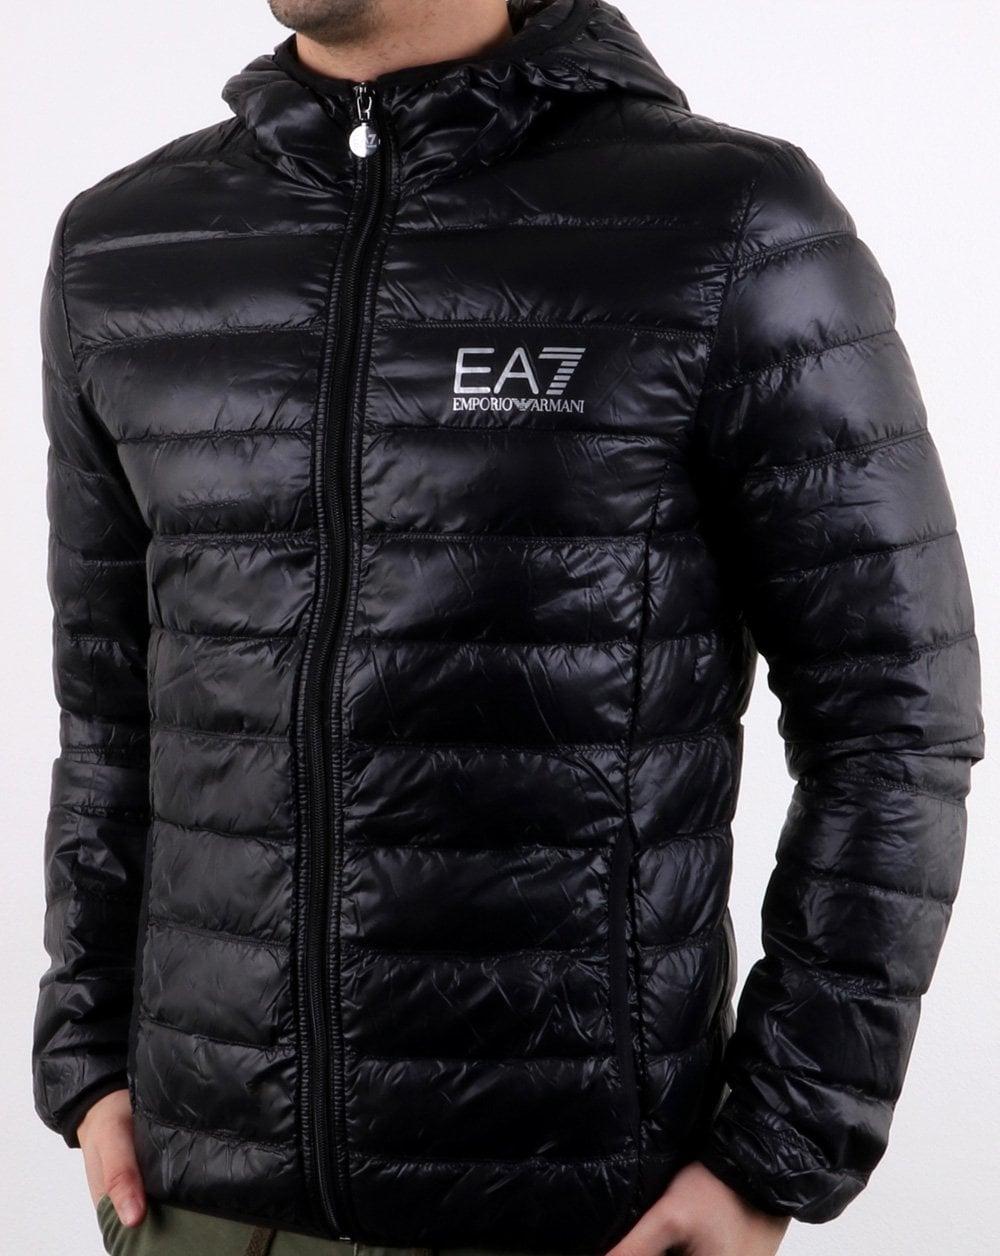 06e3dc458bc9 Emporio Armani EA7 Core Logo Down Hooded Jacket Black